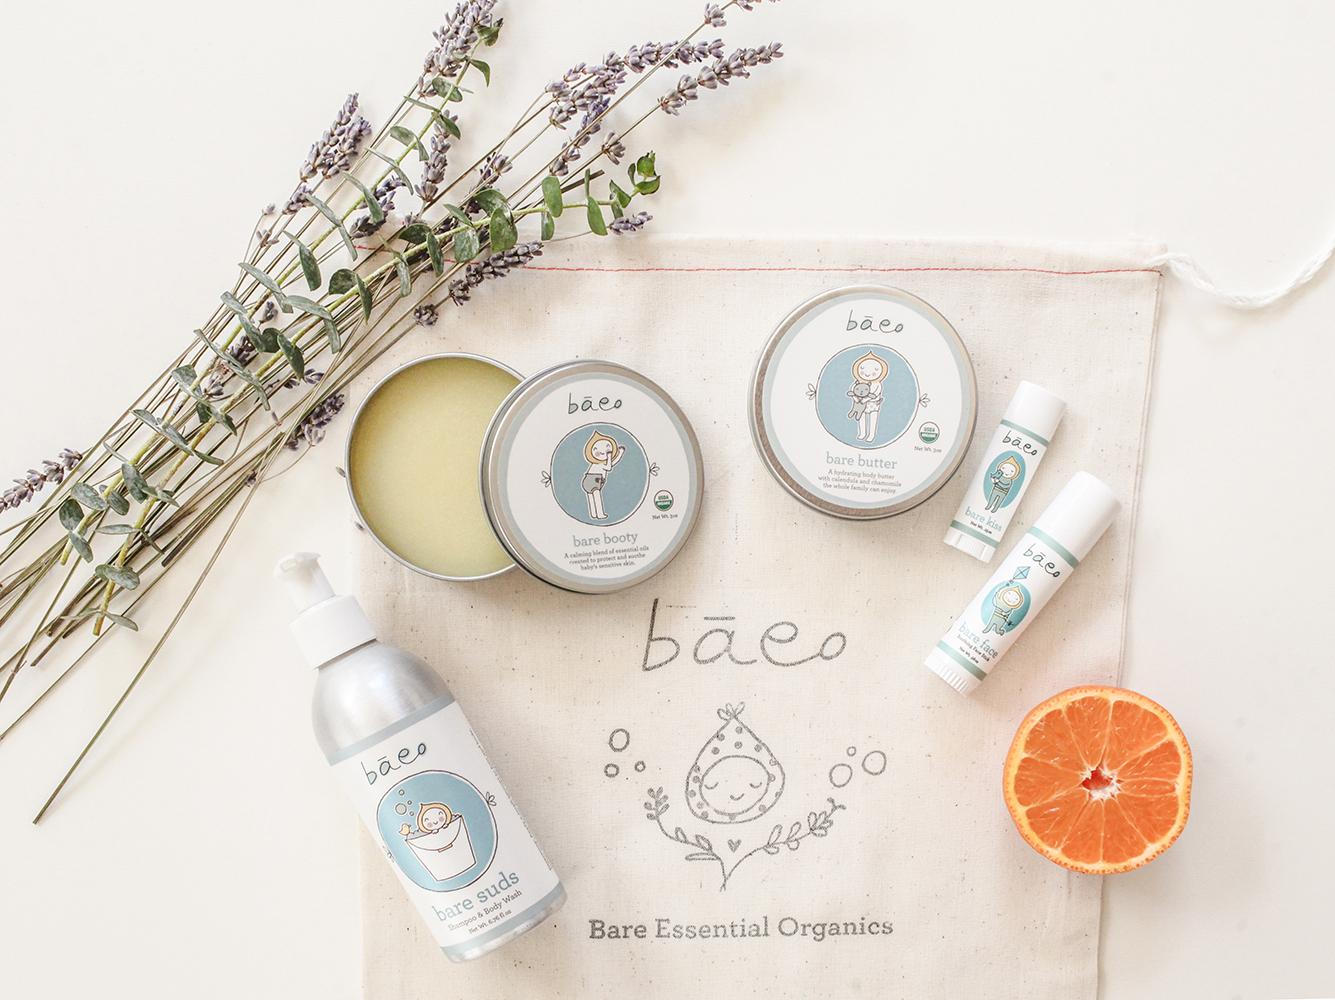 Baeo Bare Essential Organics